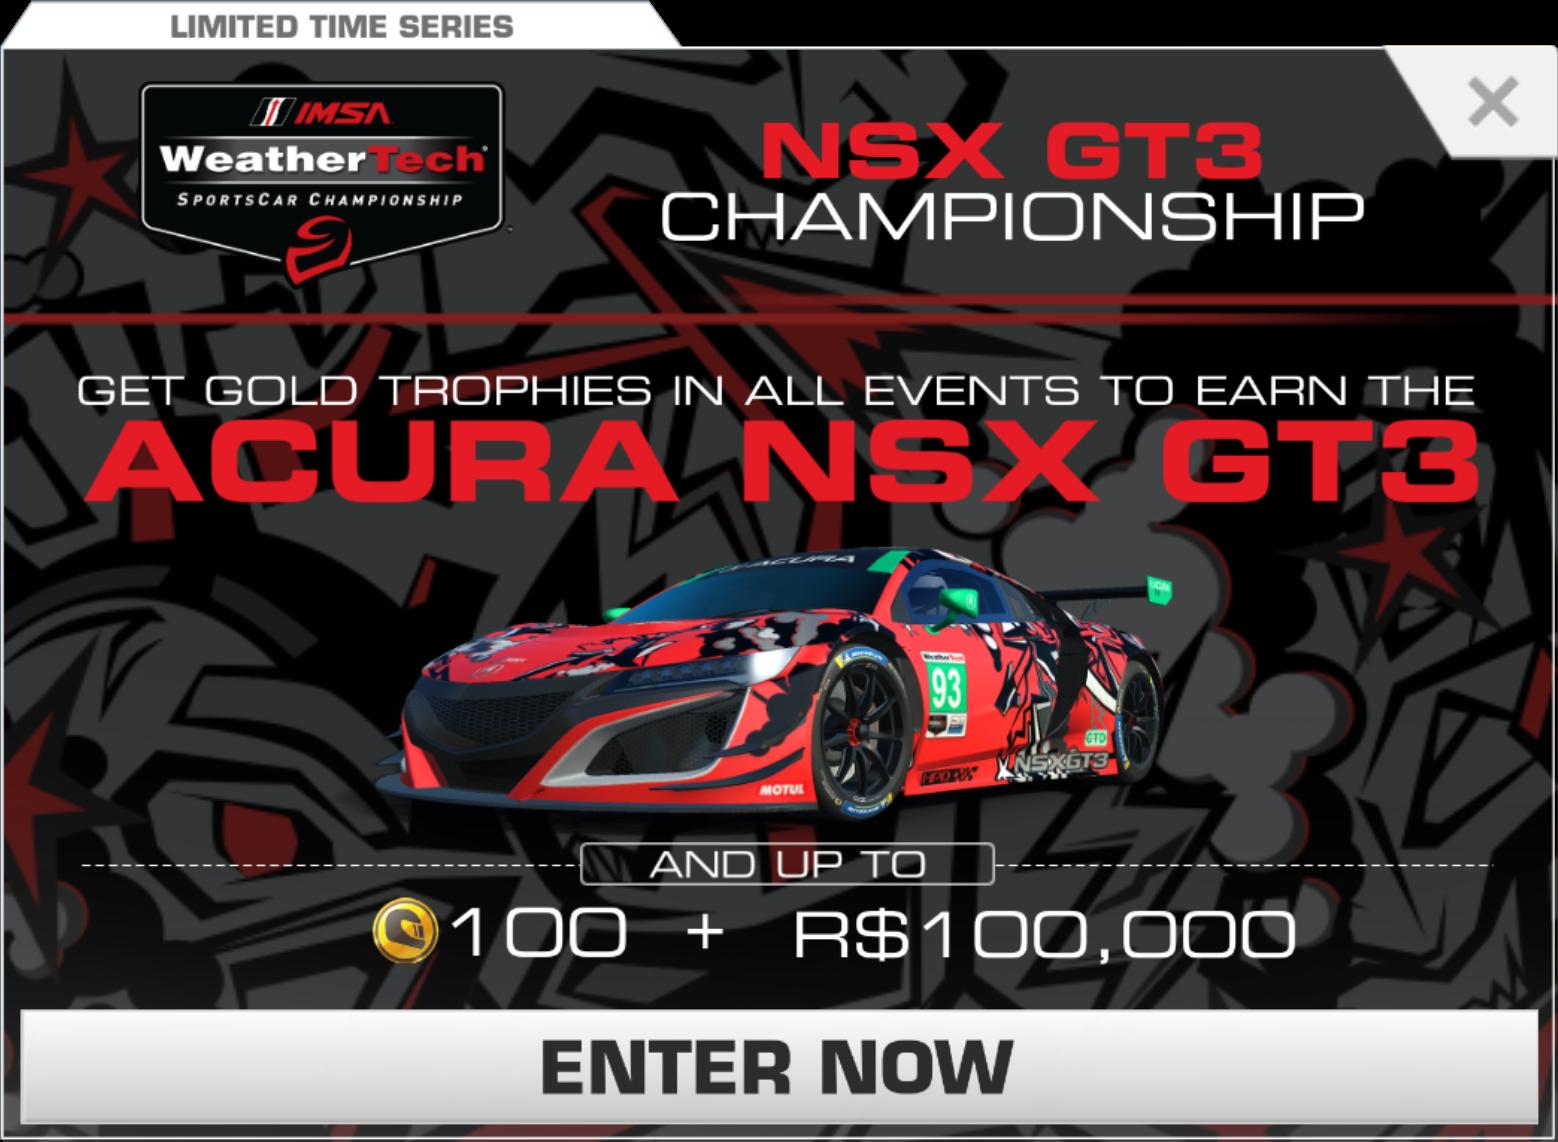 Acura nsx gt3 championship